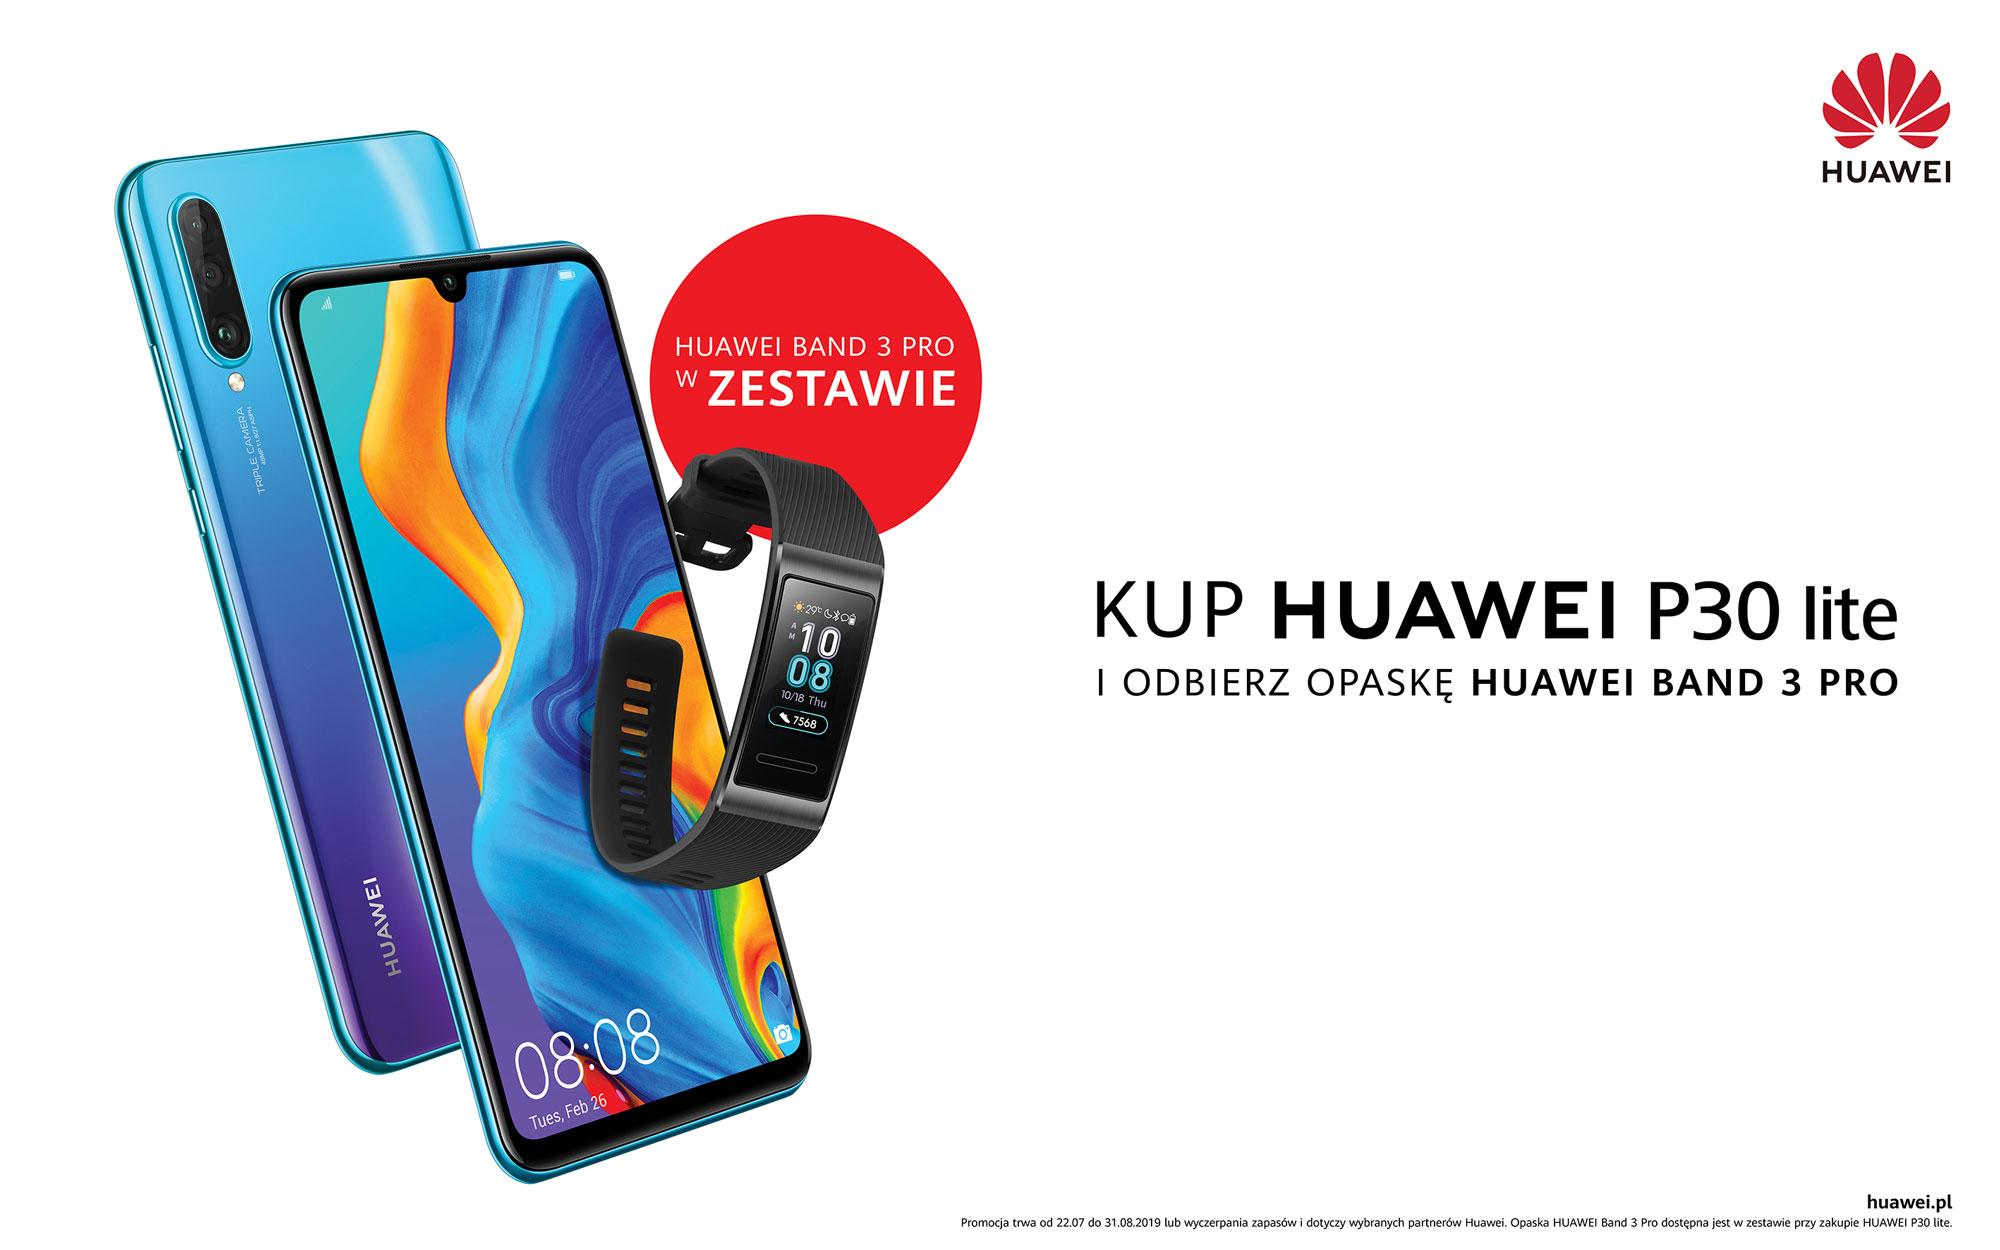 Huawei P30 lite z opaską Huawei Band 3 Pro gratis